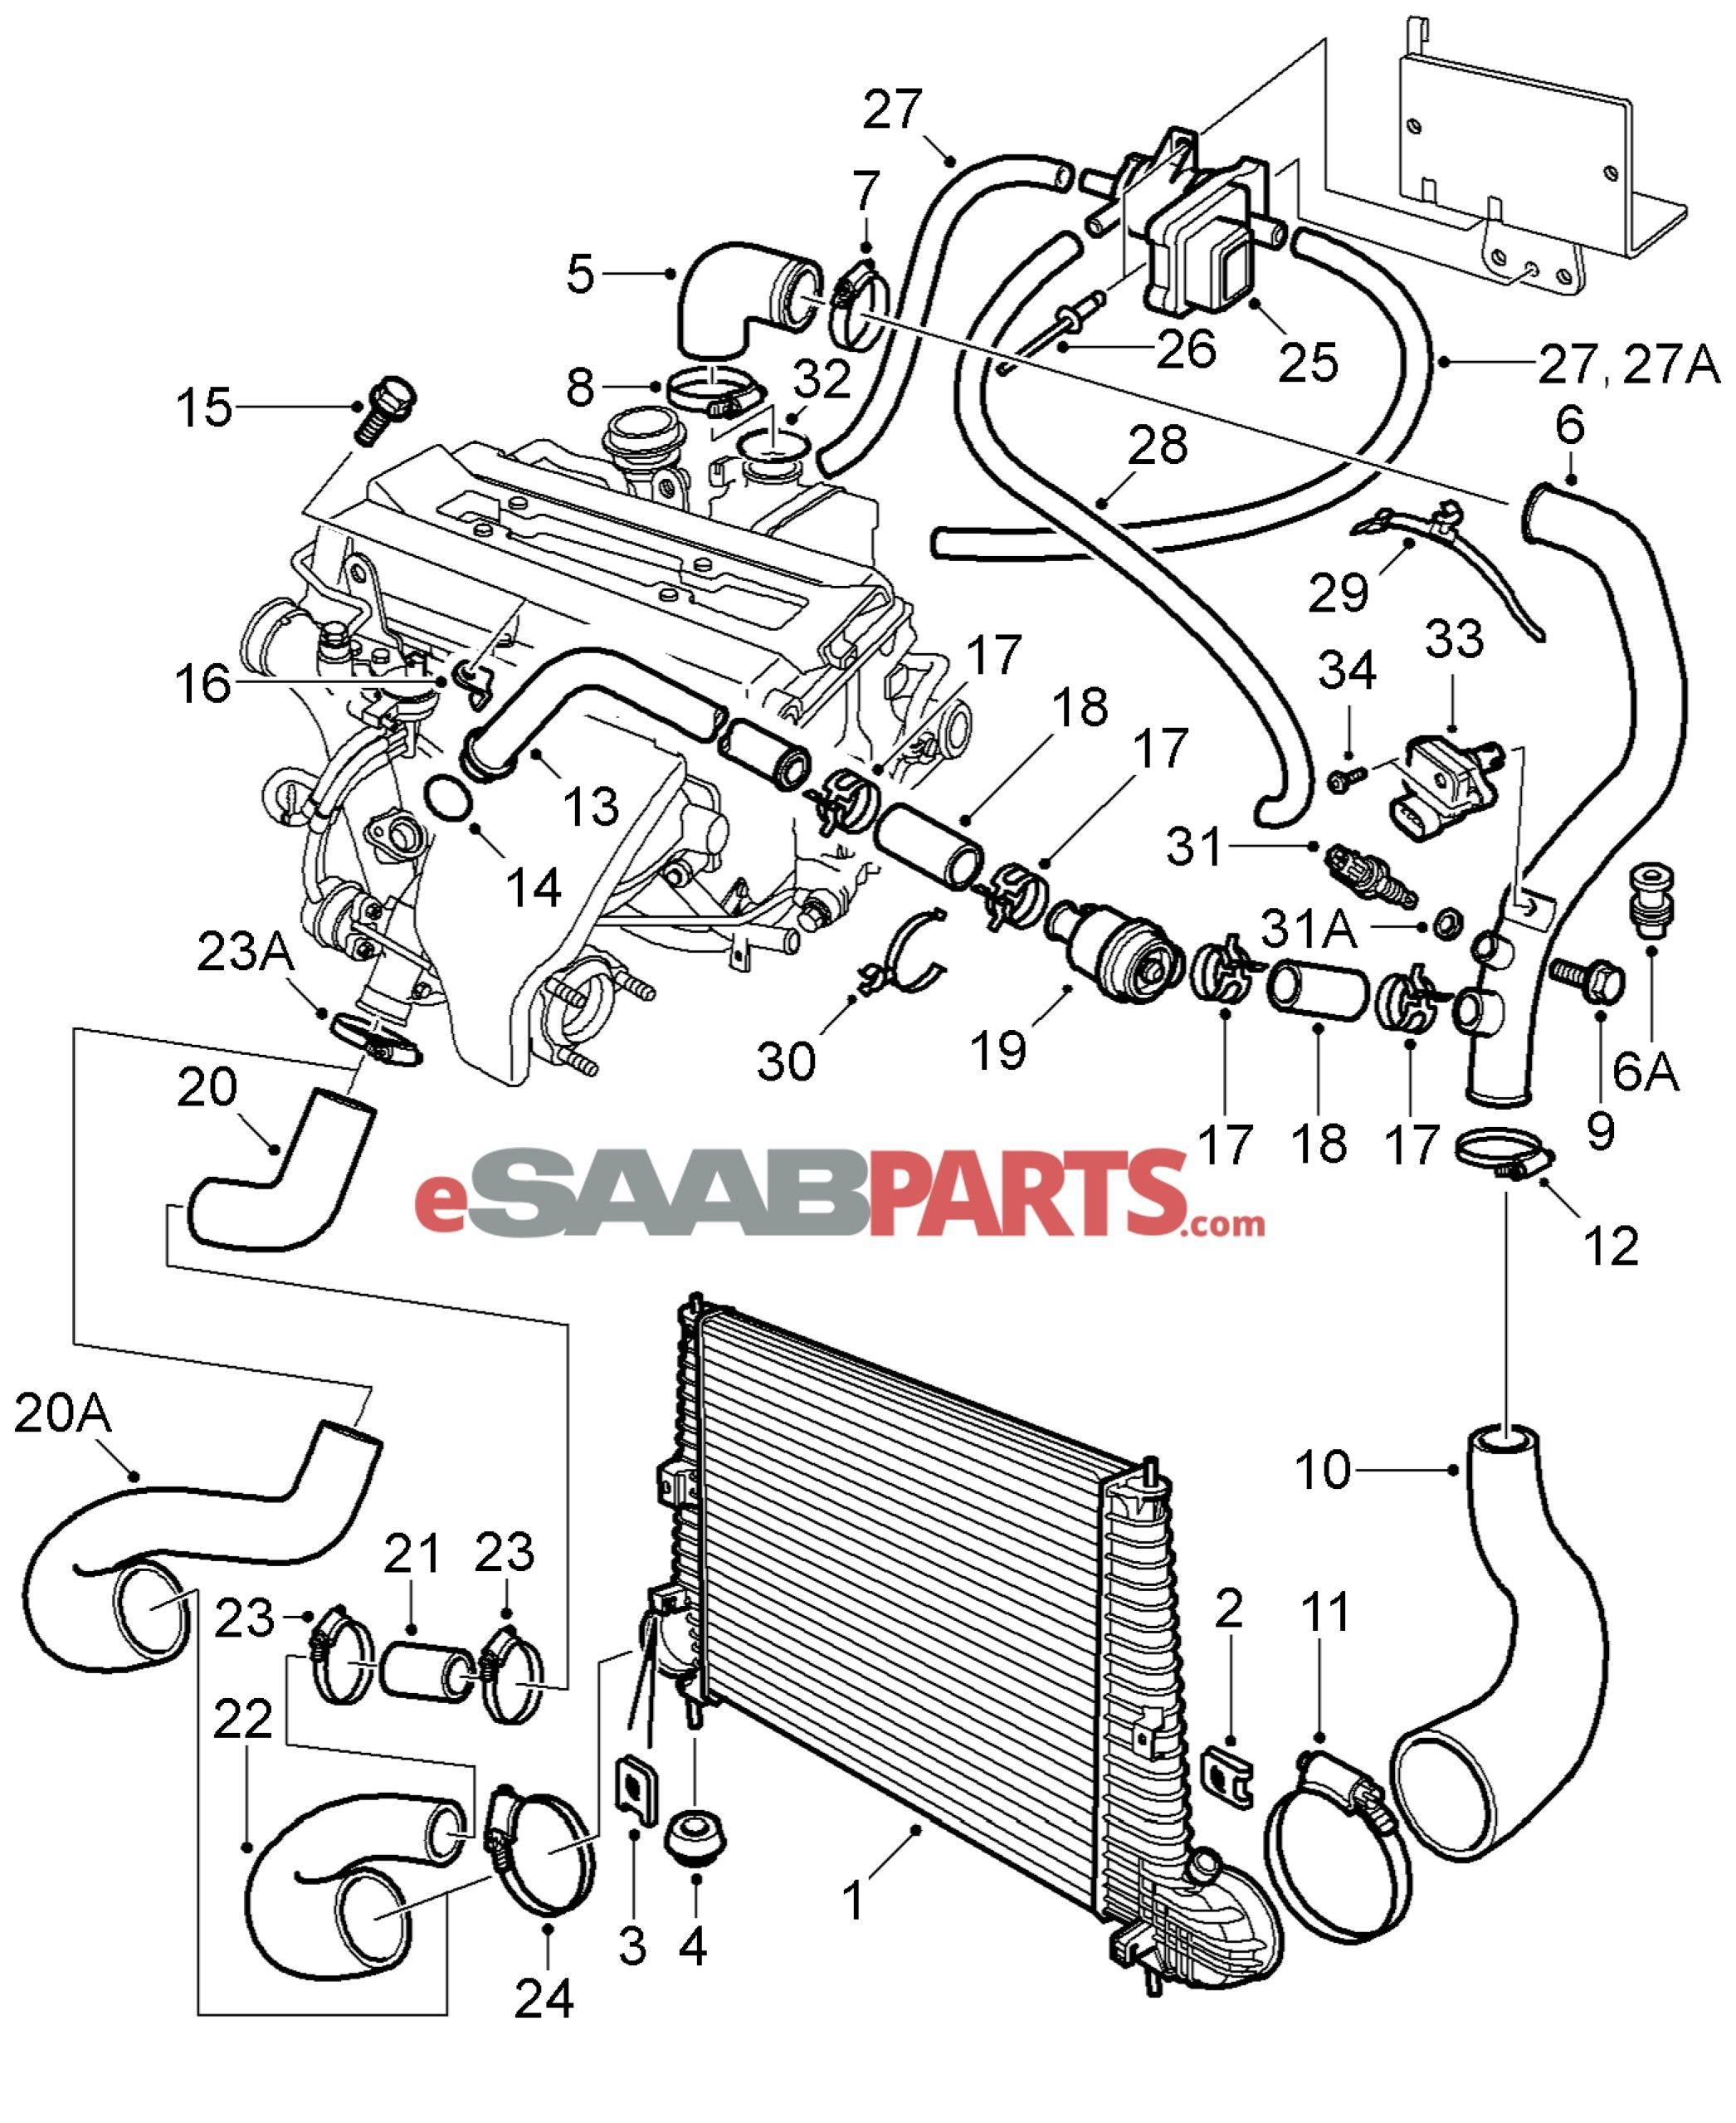 2005 saab 9 5 engine part diagram basic guide wiring